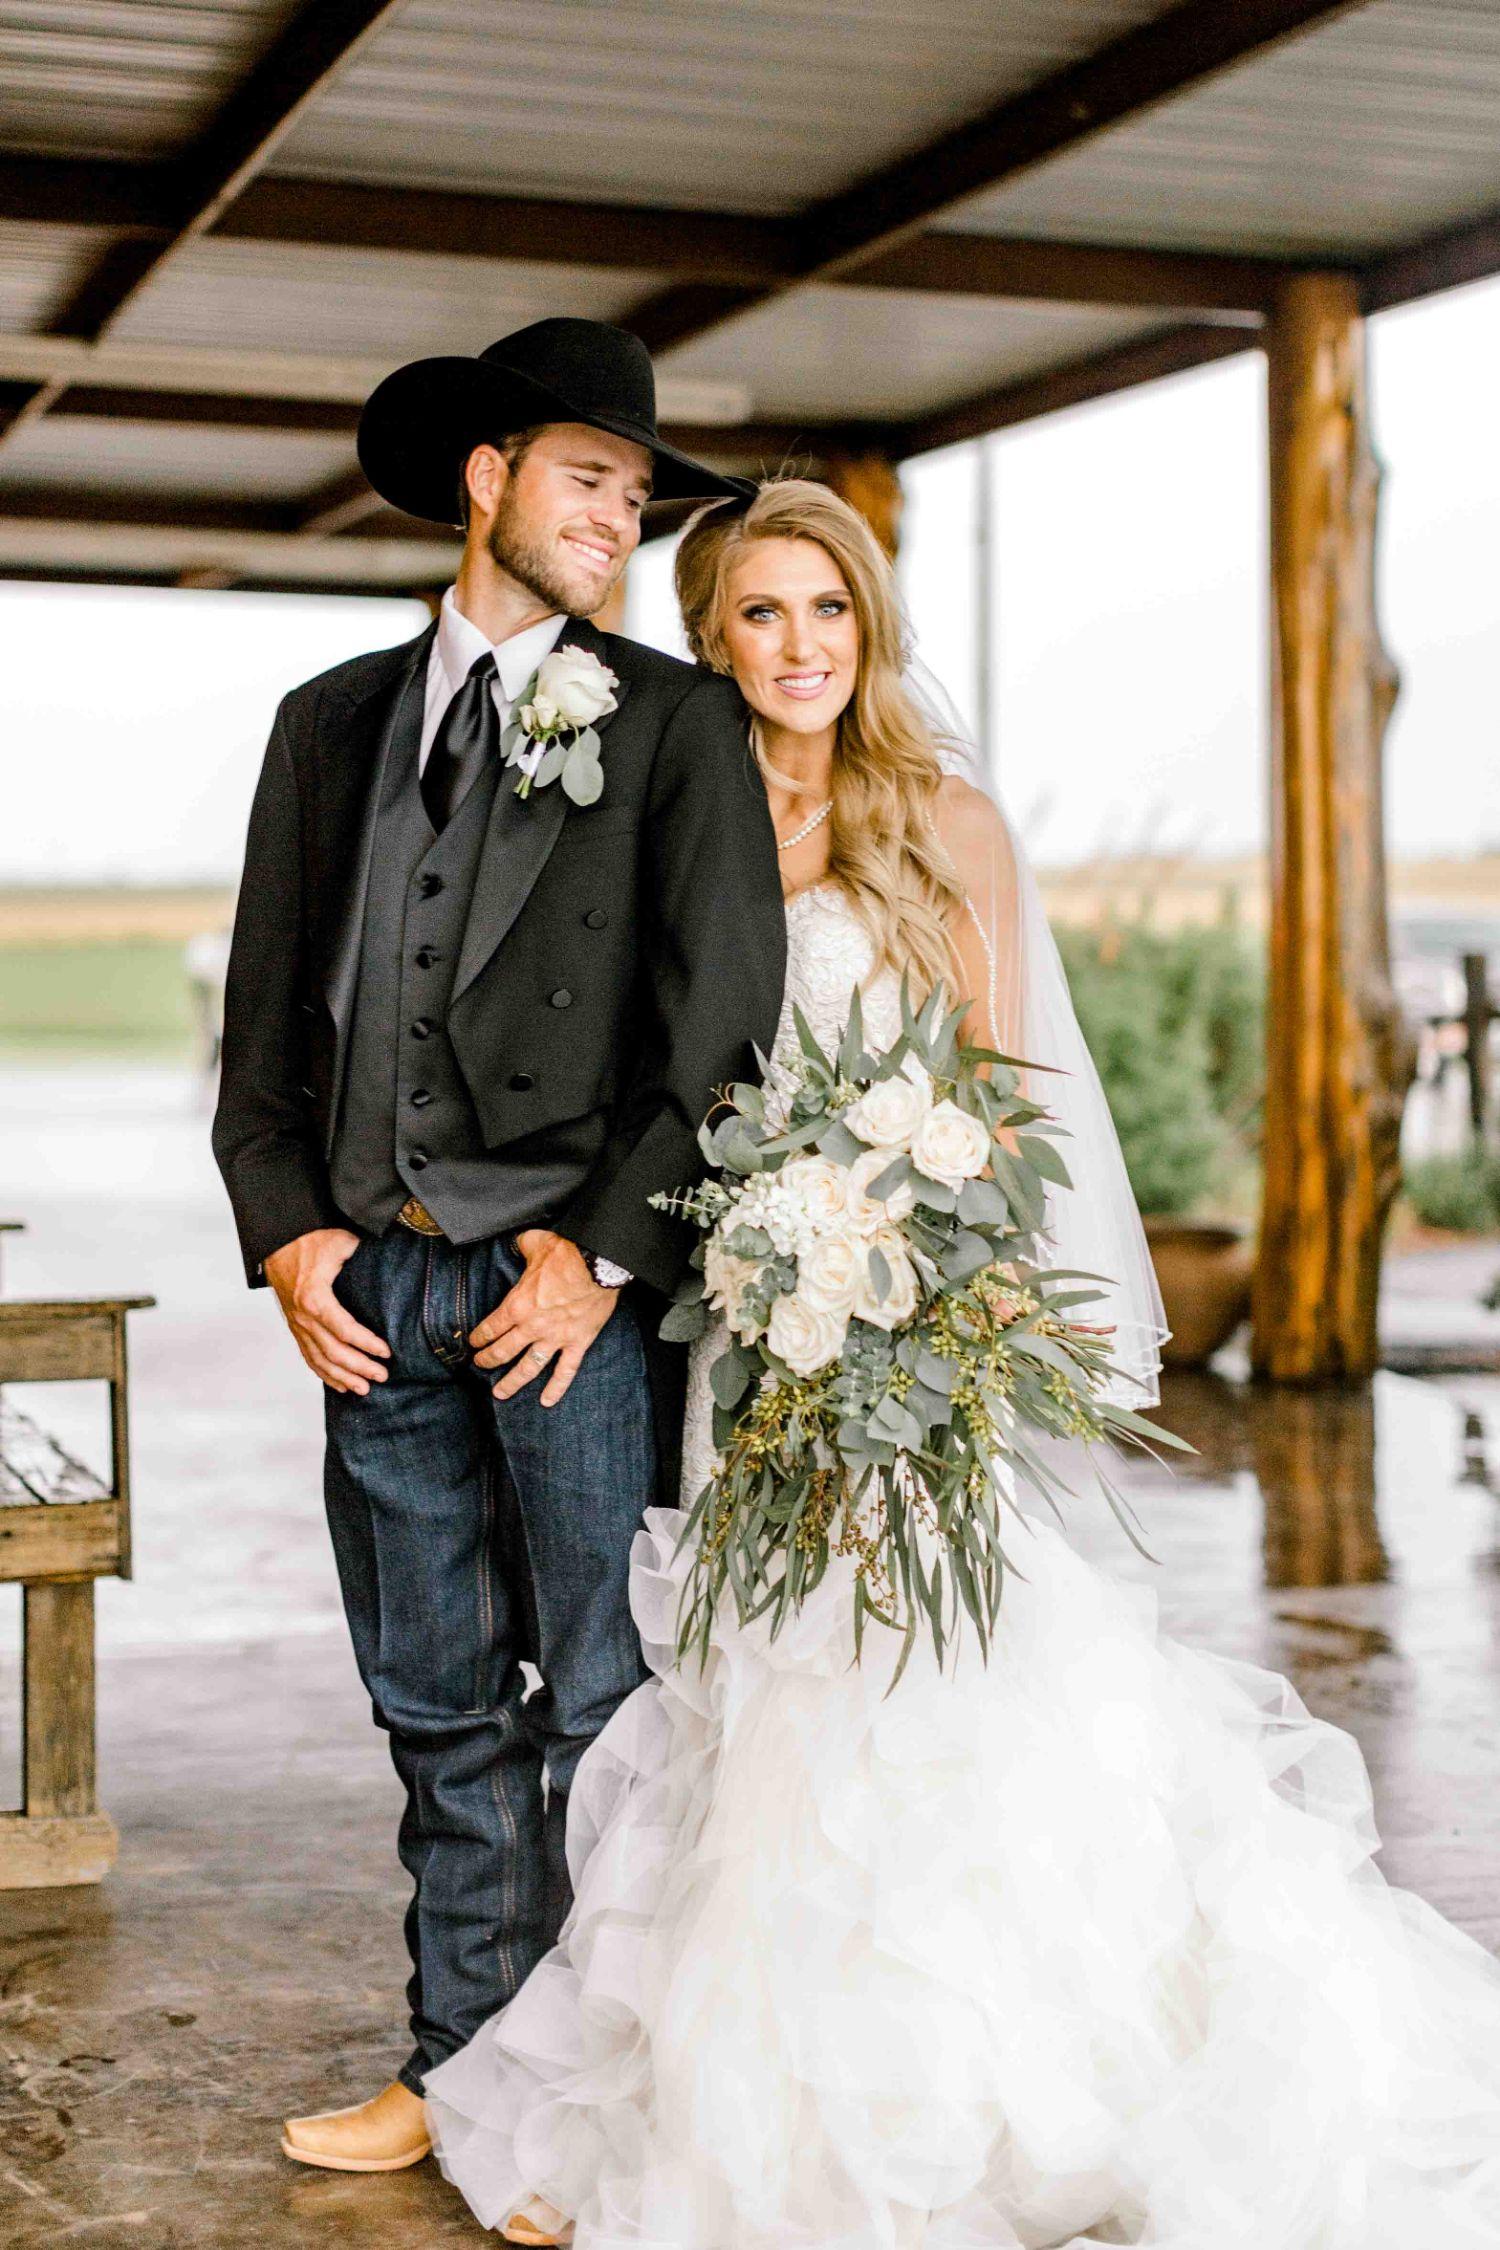 wichita-falls-wedding-katelyn-colten-vernon-texas-31.jpg